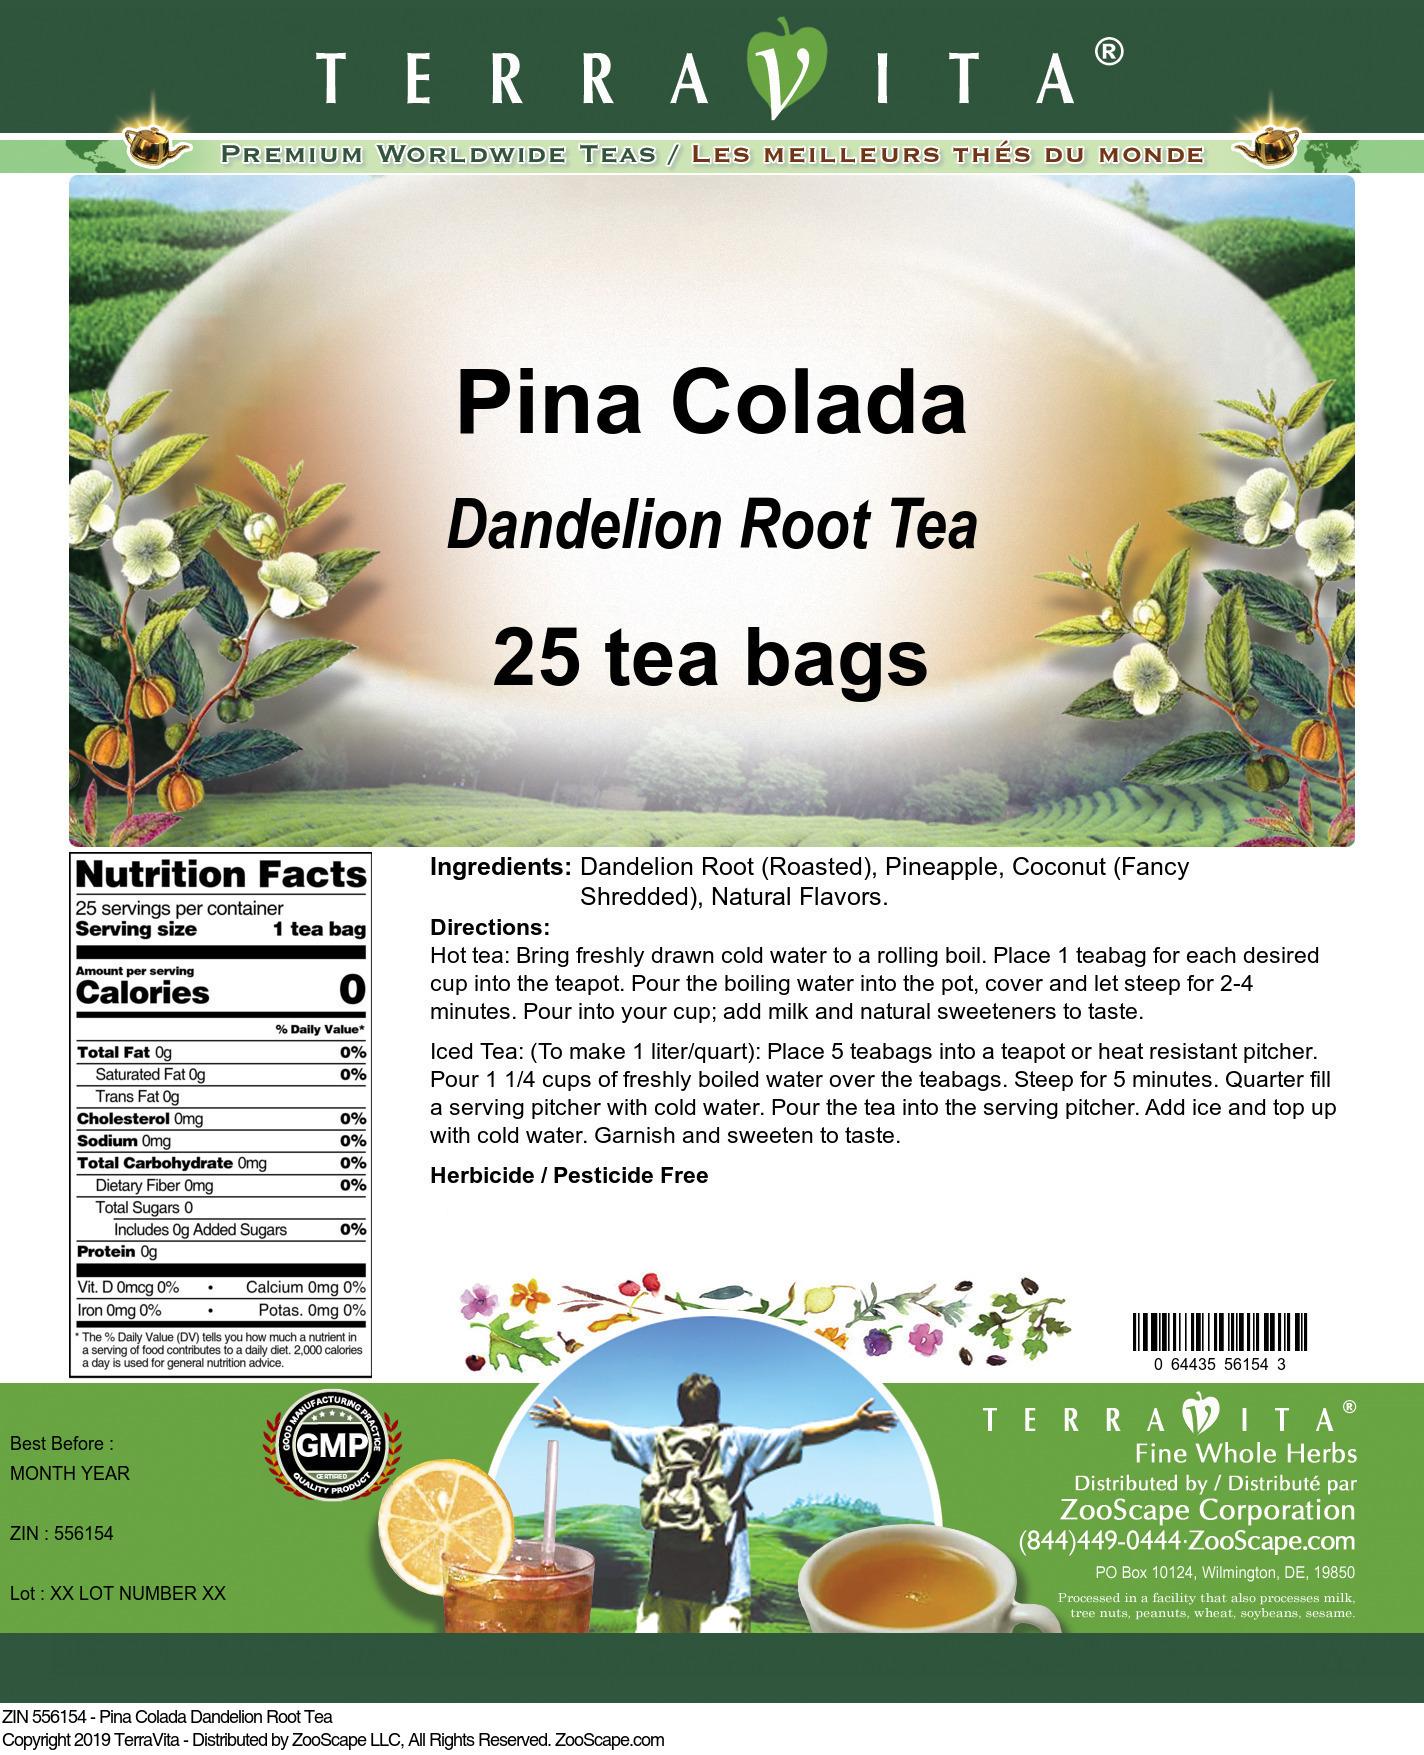 Pina Colada Dandelion Root